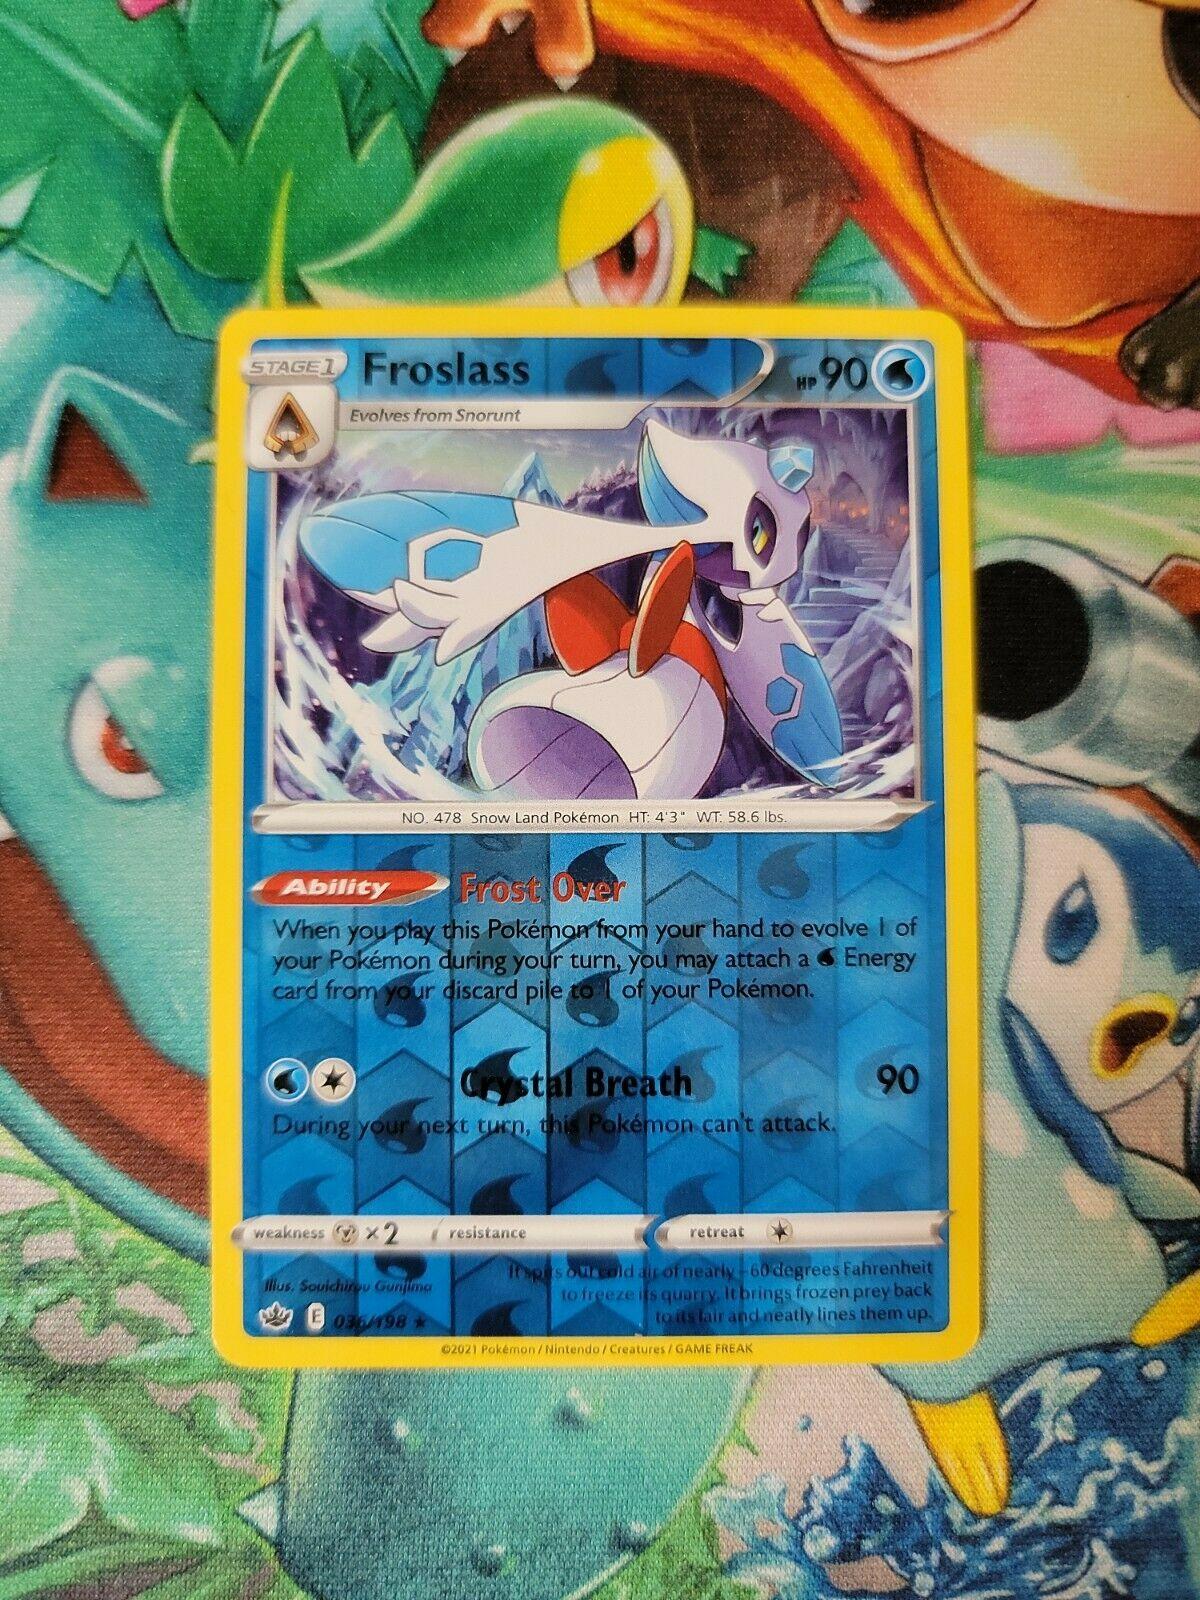 Pokemon Rare Reverse Holo Foil Froslass Card 036/198 SWSH Chilling Reign